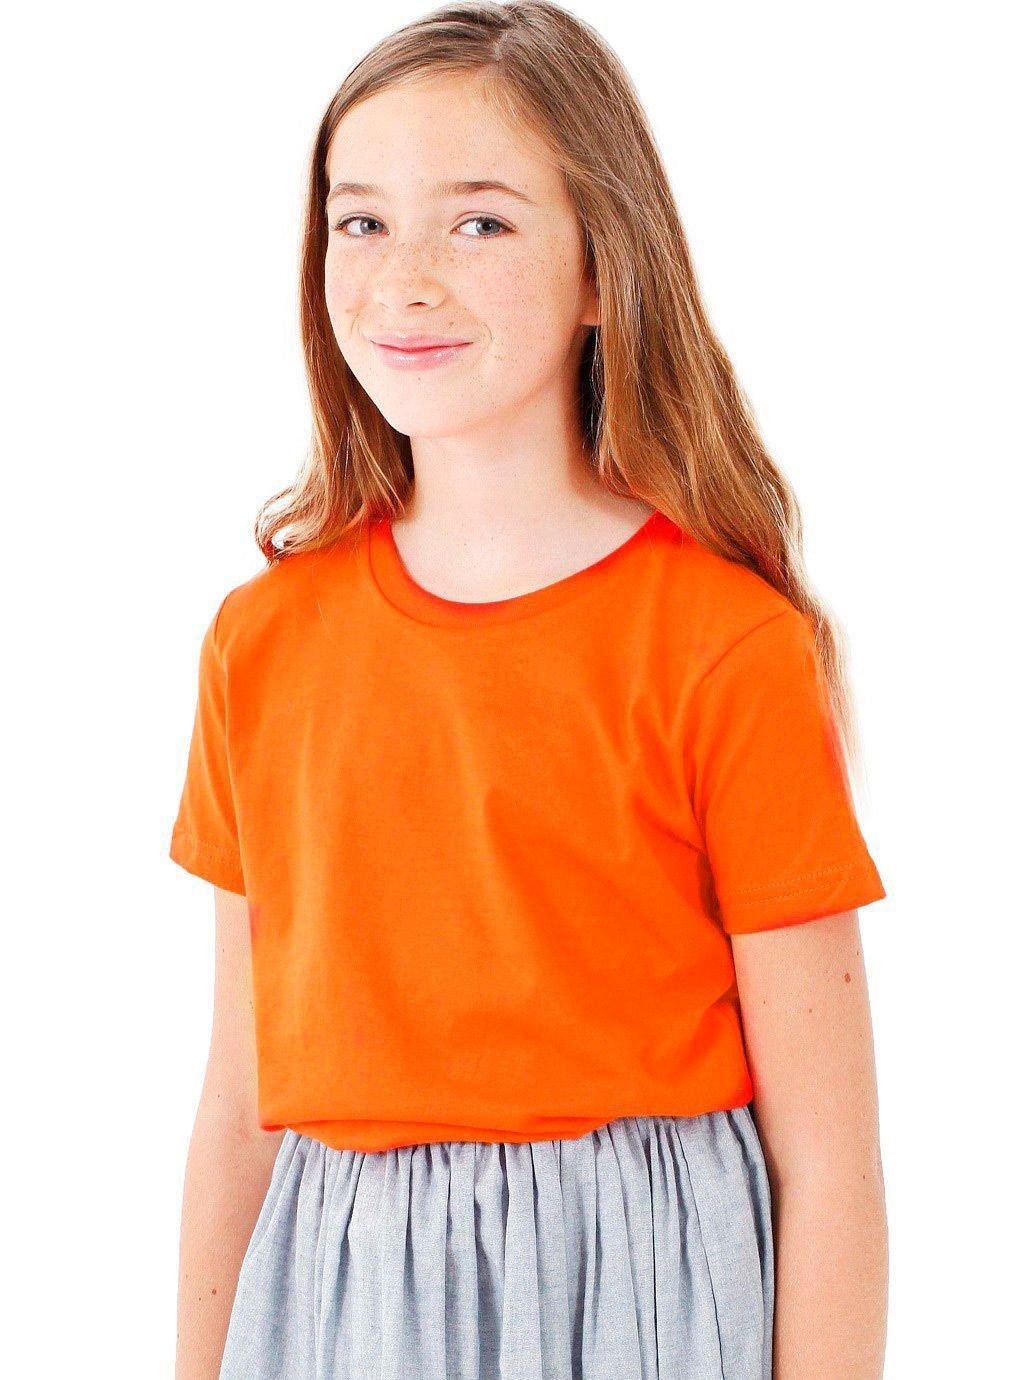 American Apparel Boys Fine Jersey Short-Sleeve T-Shirt (2201) -ORANGE -8